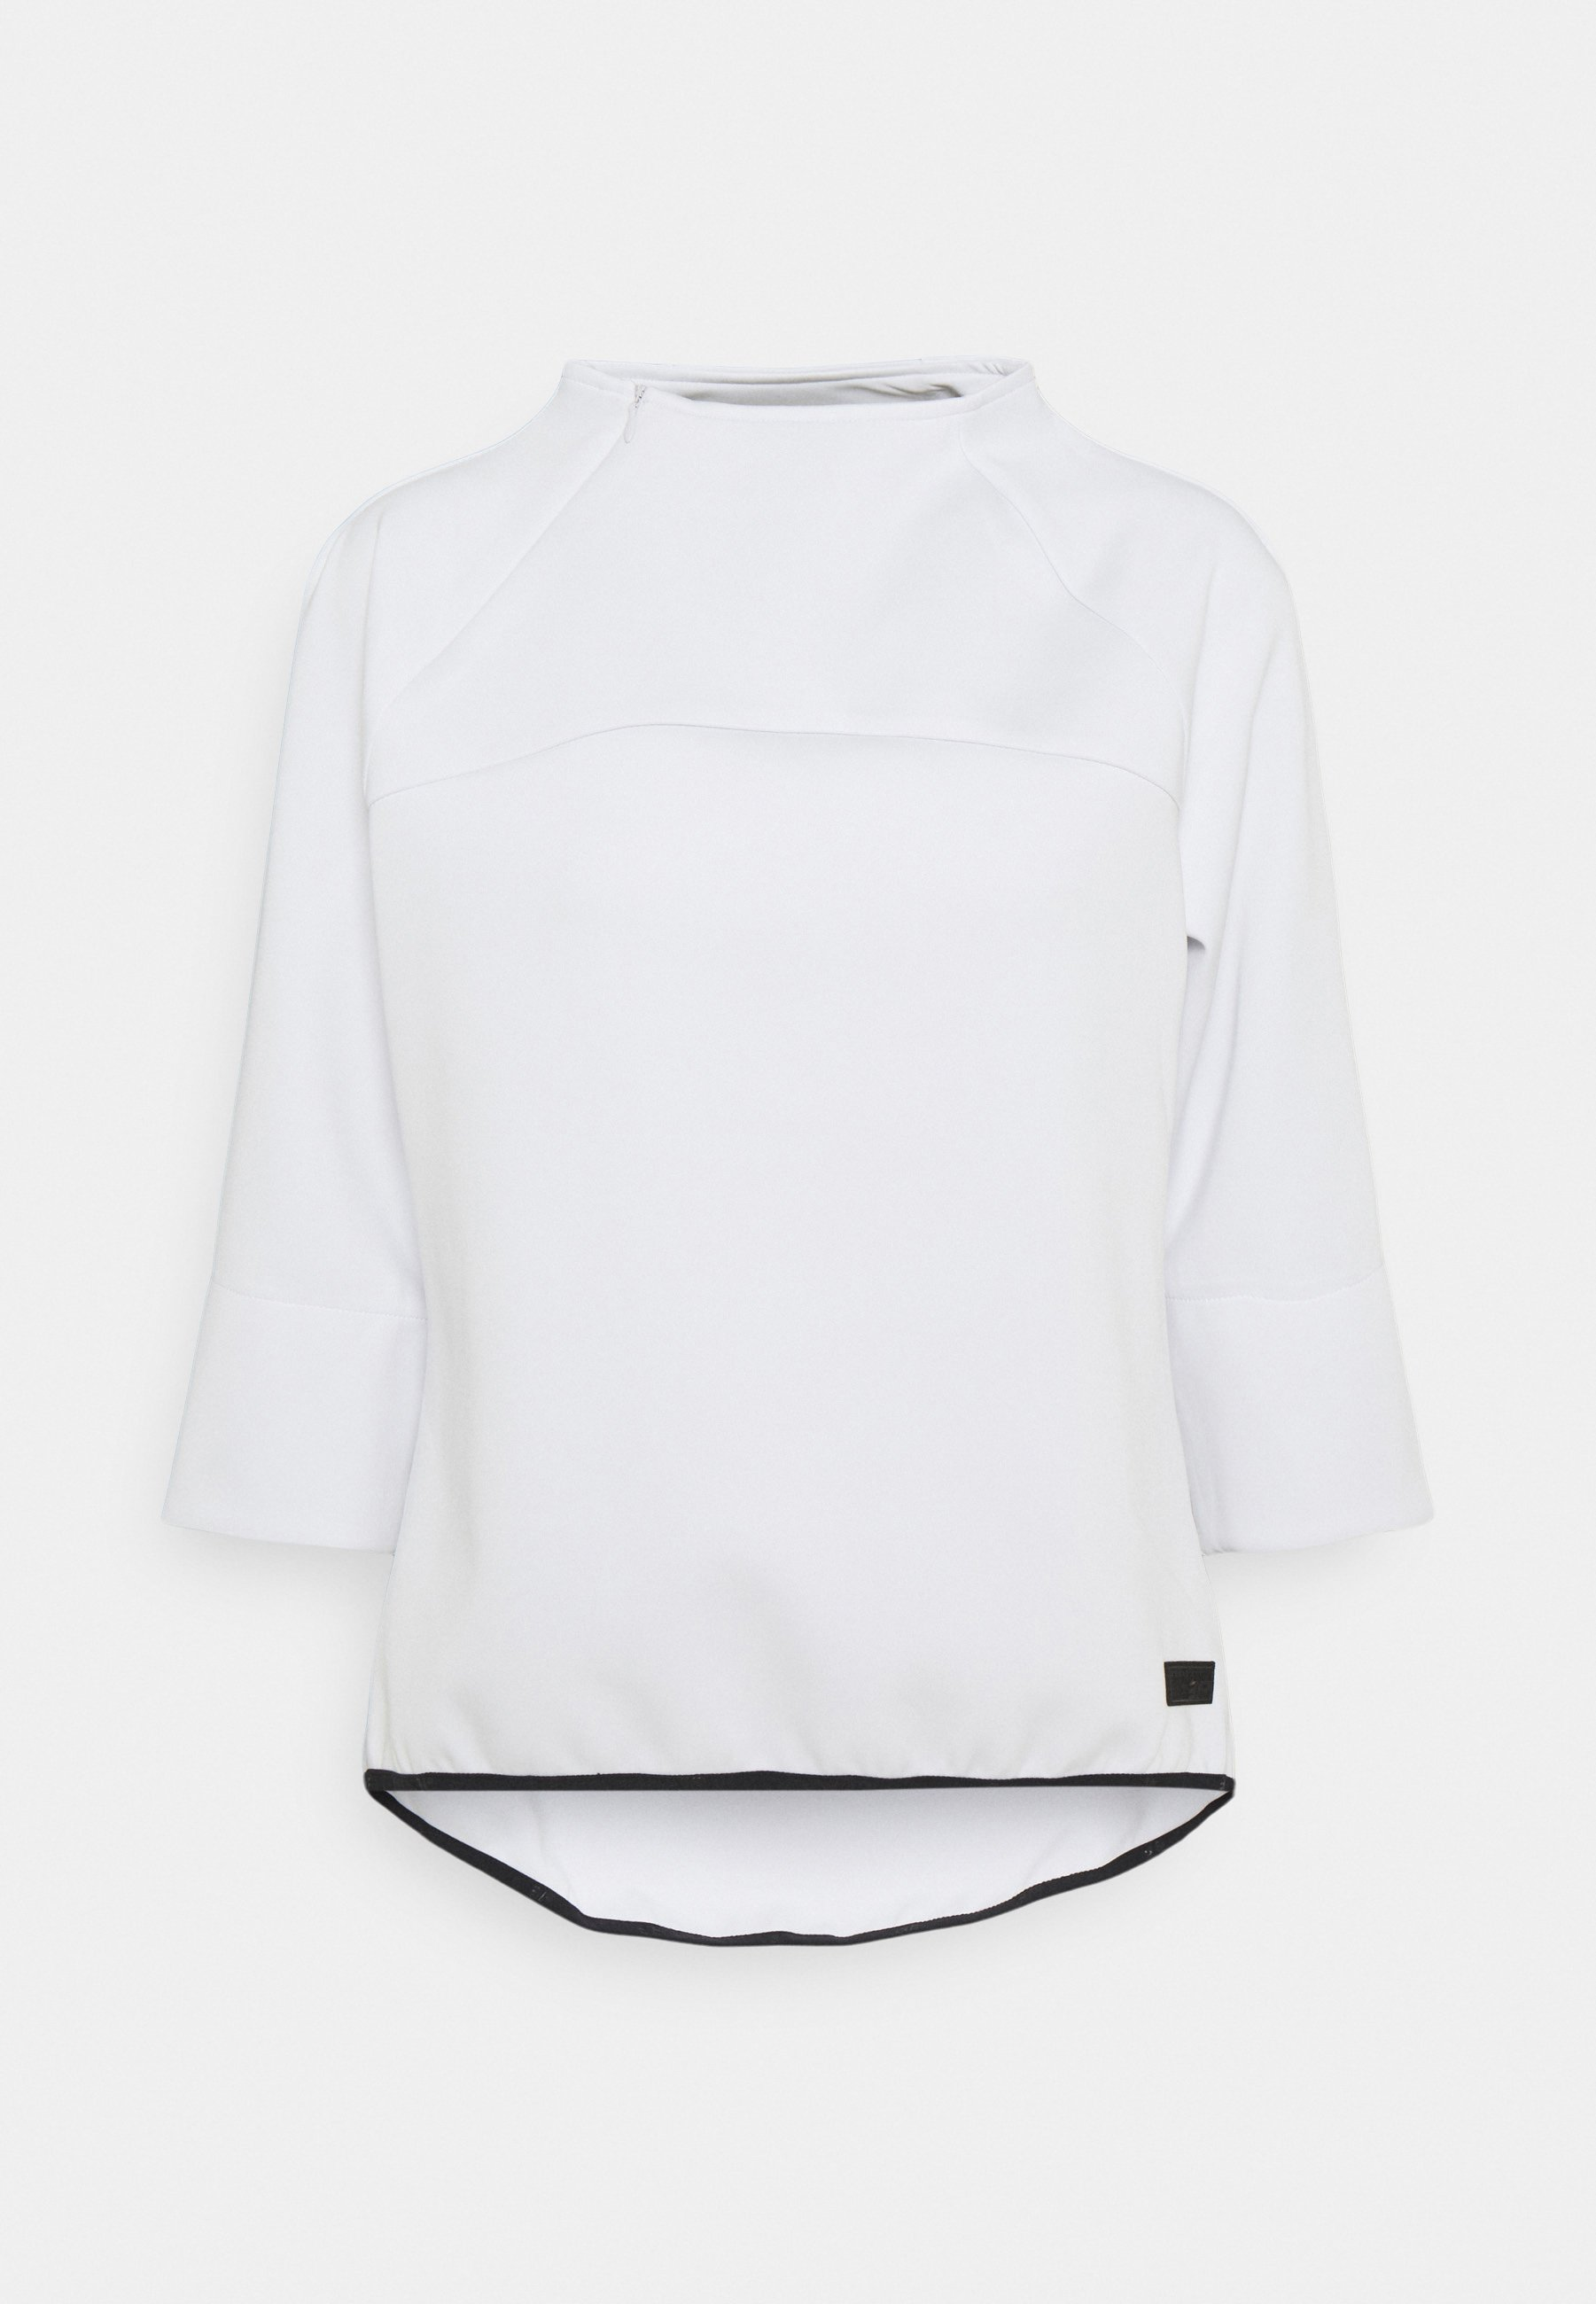 Femme ANGLETON - T-shirt à manches longues